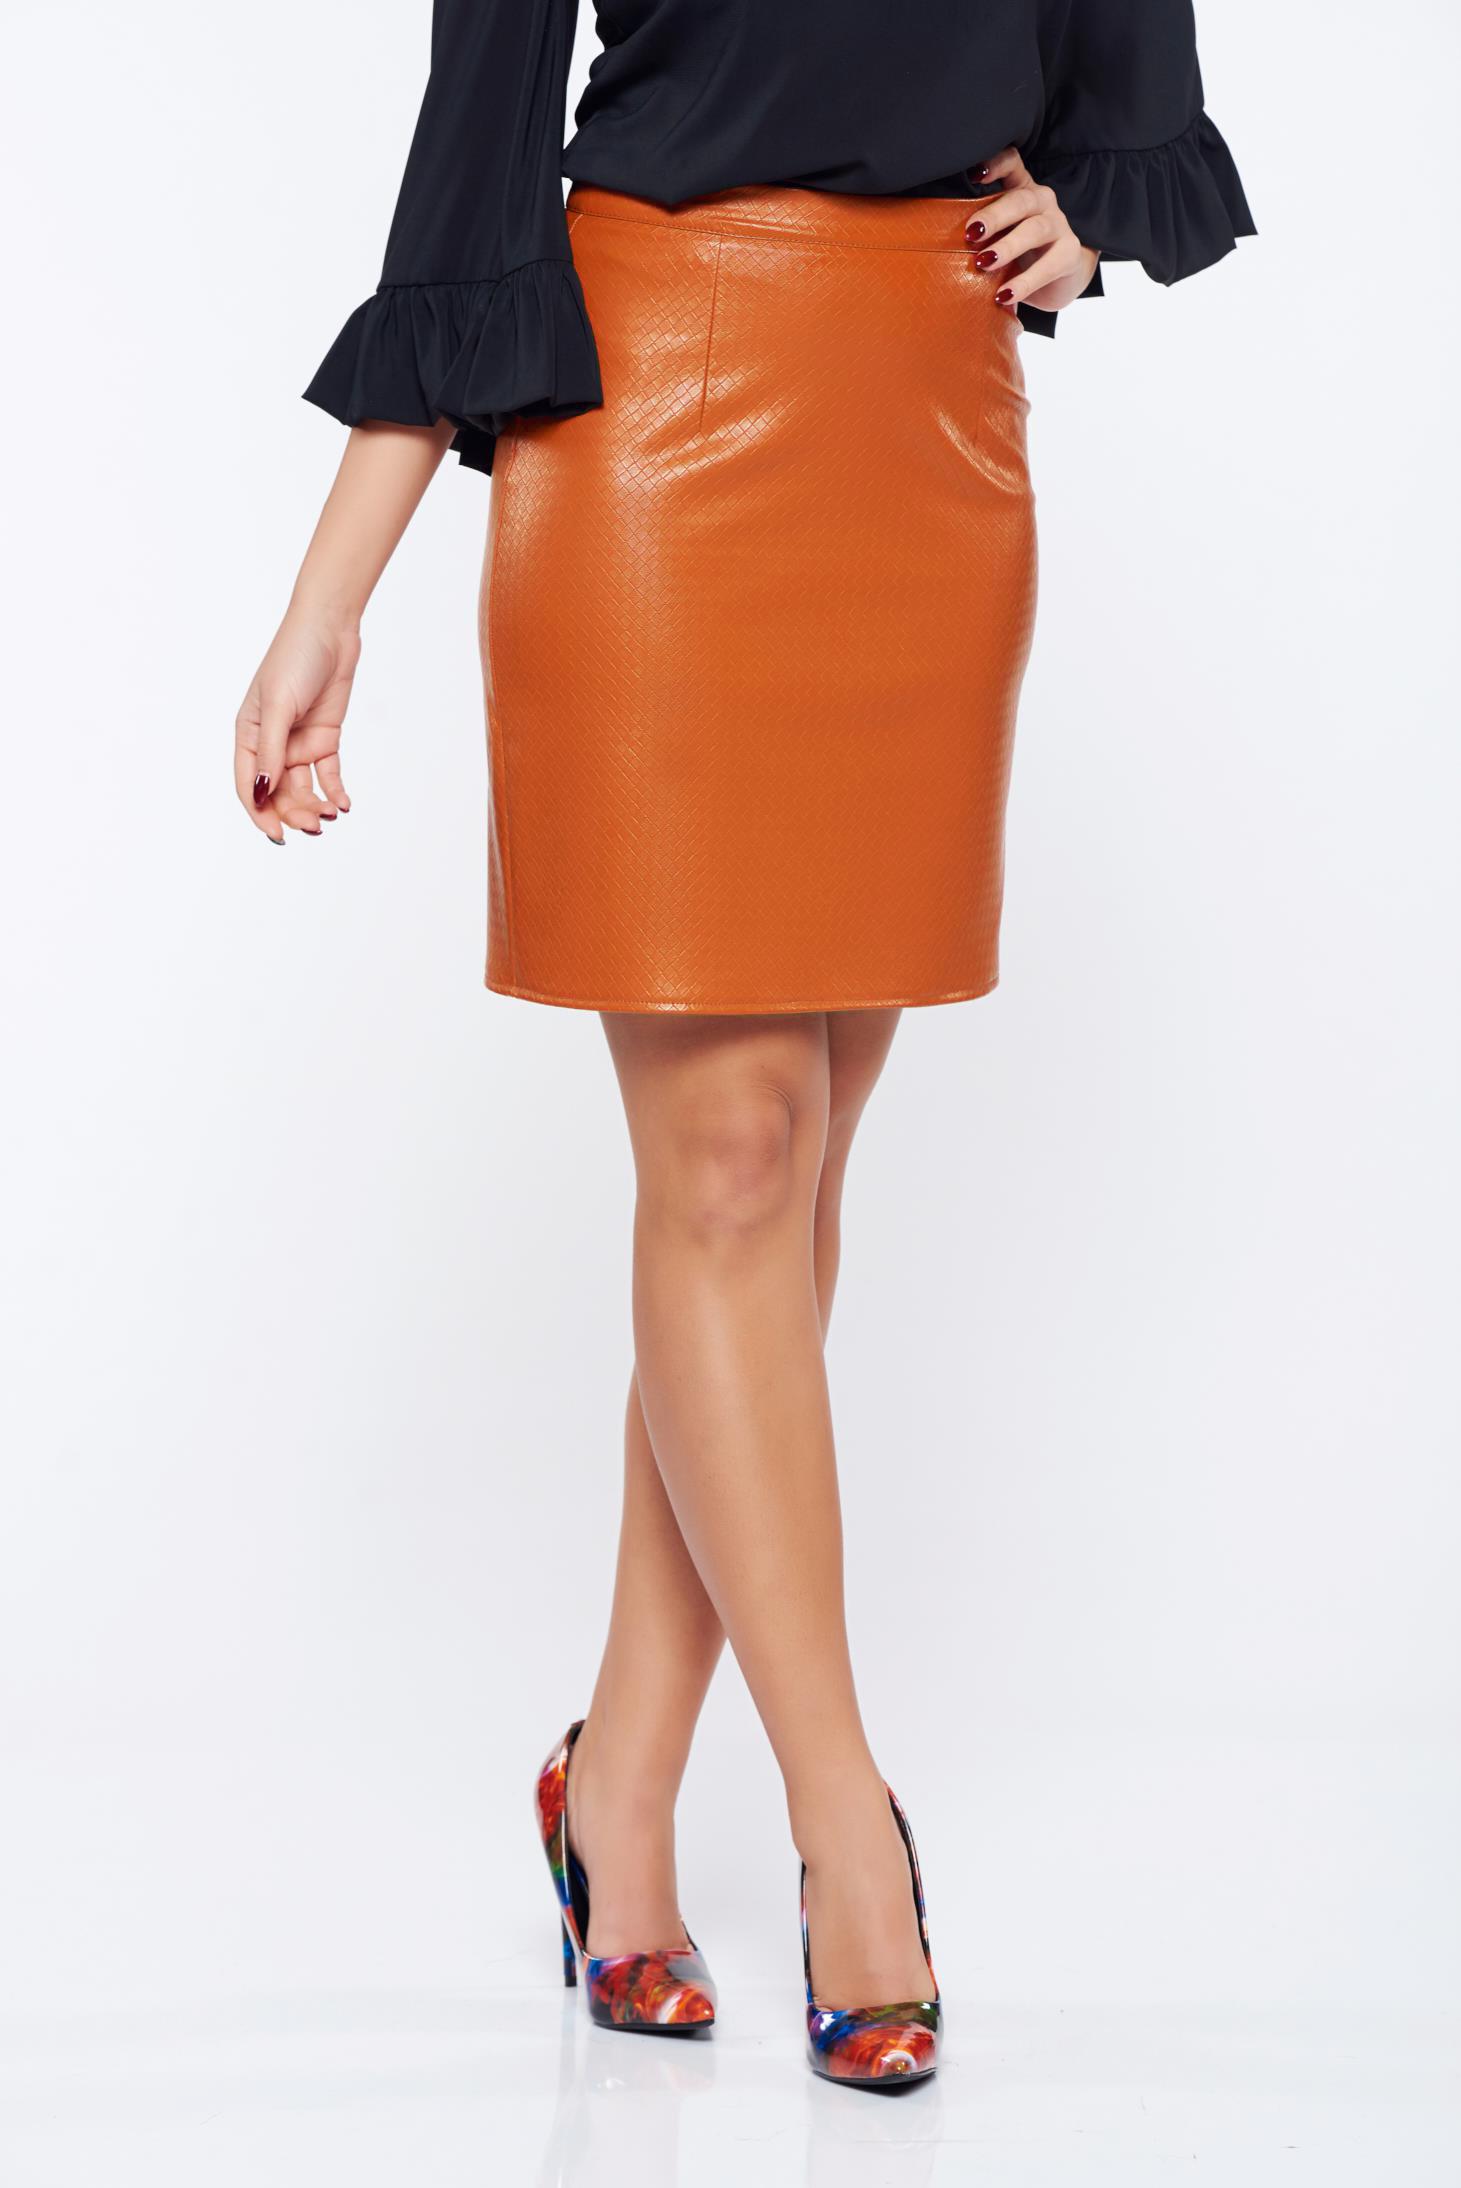 Fusta StarShinerS portocalie casual din piele ecologica cu talie medie